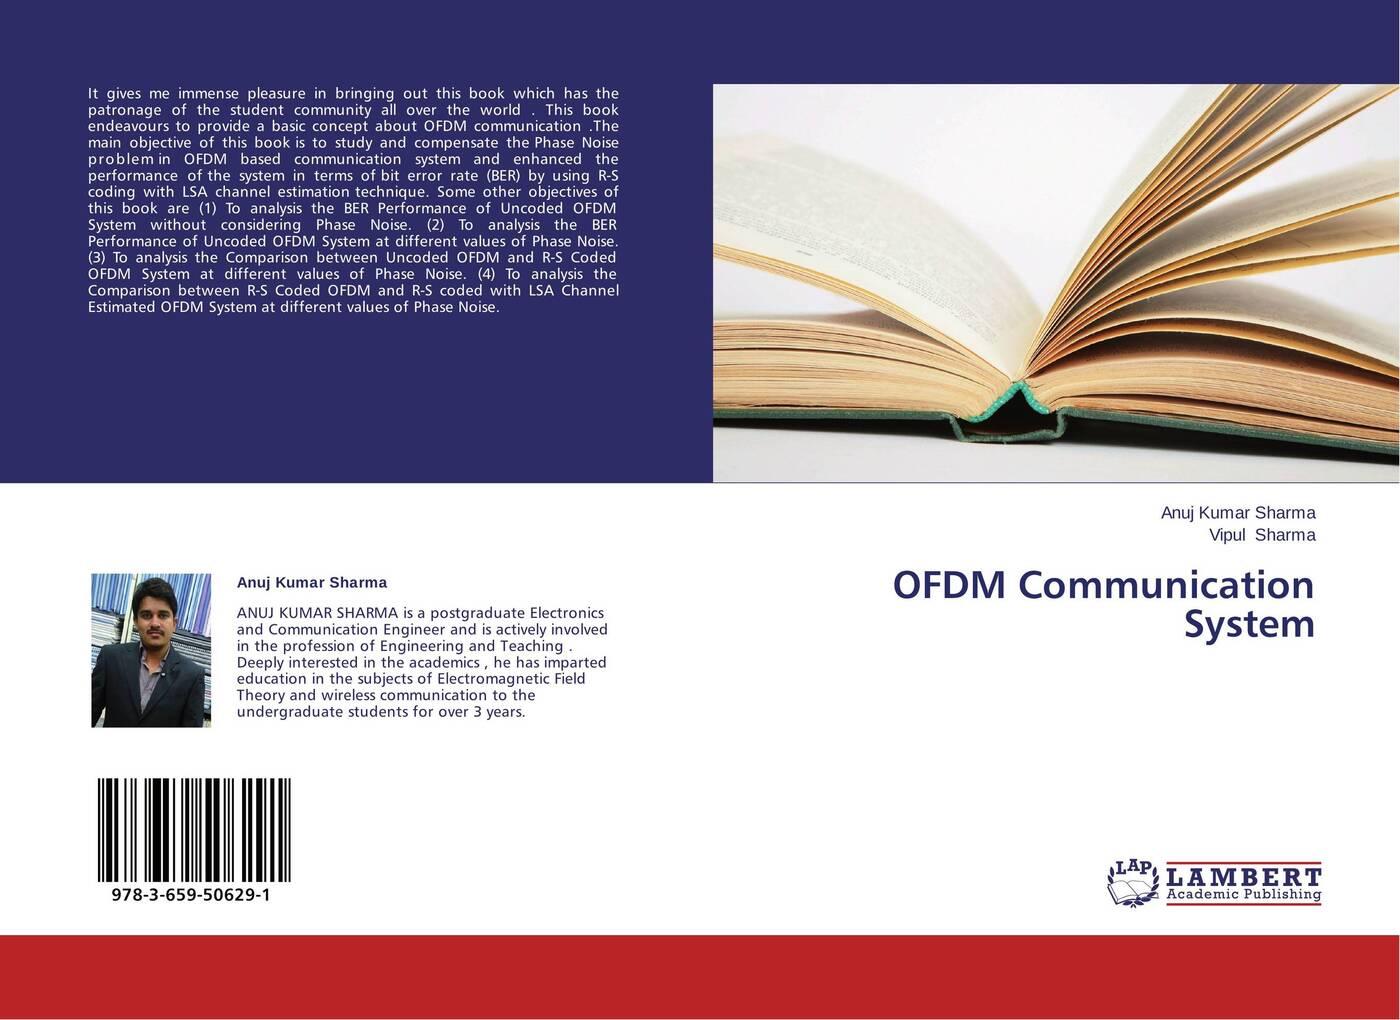 Anuj Kumar Sharma and Vipul Sharma OFDM Communication System